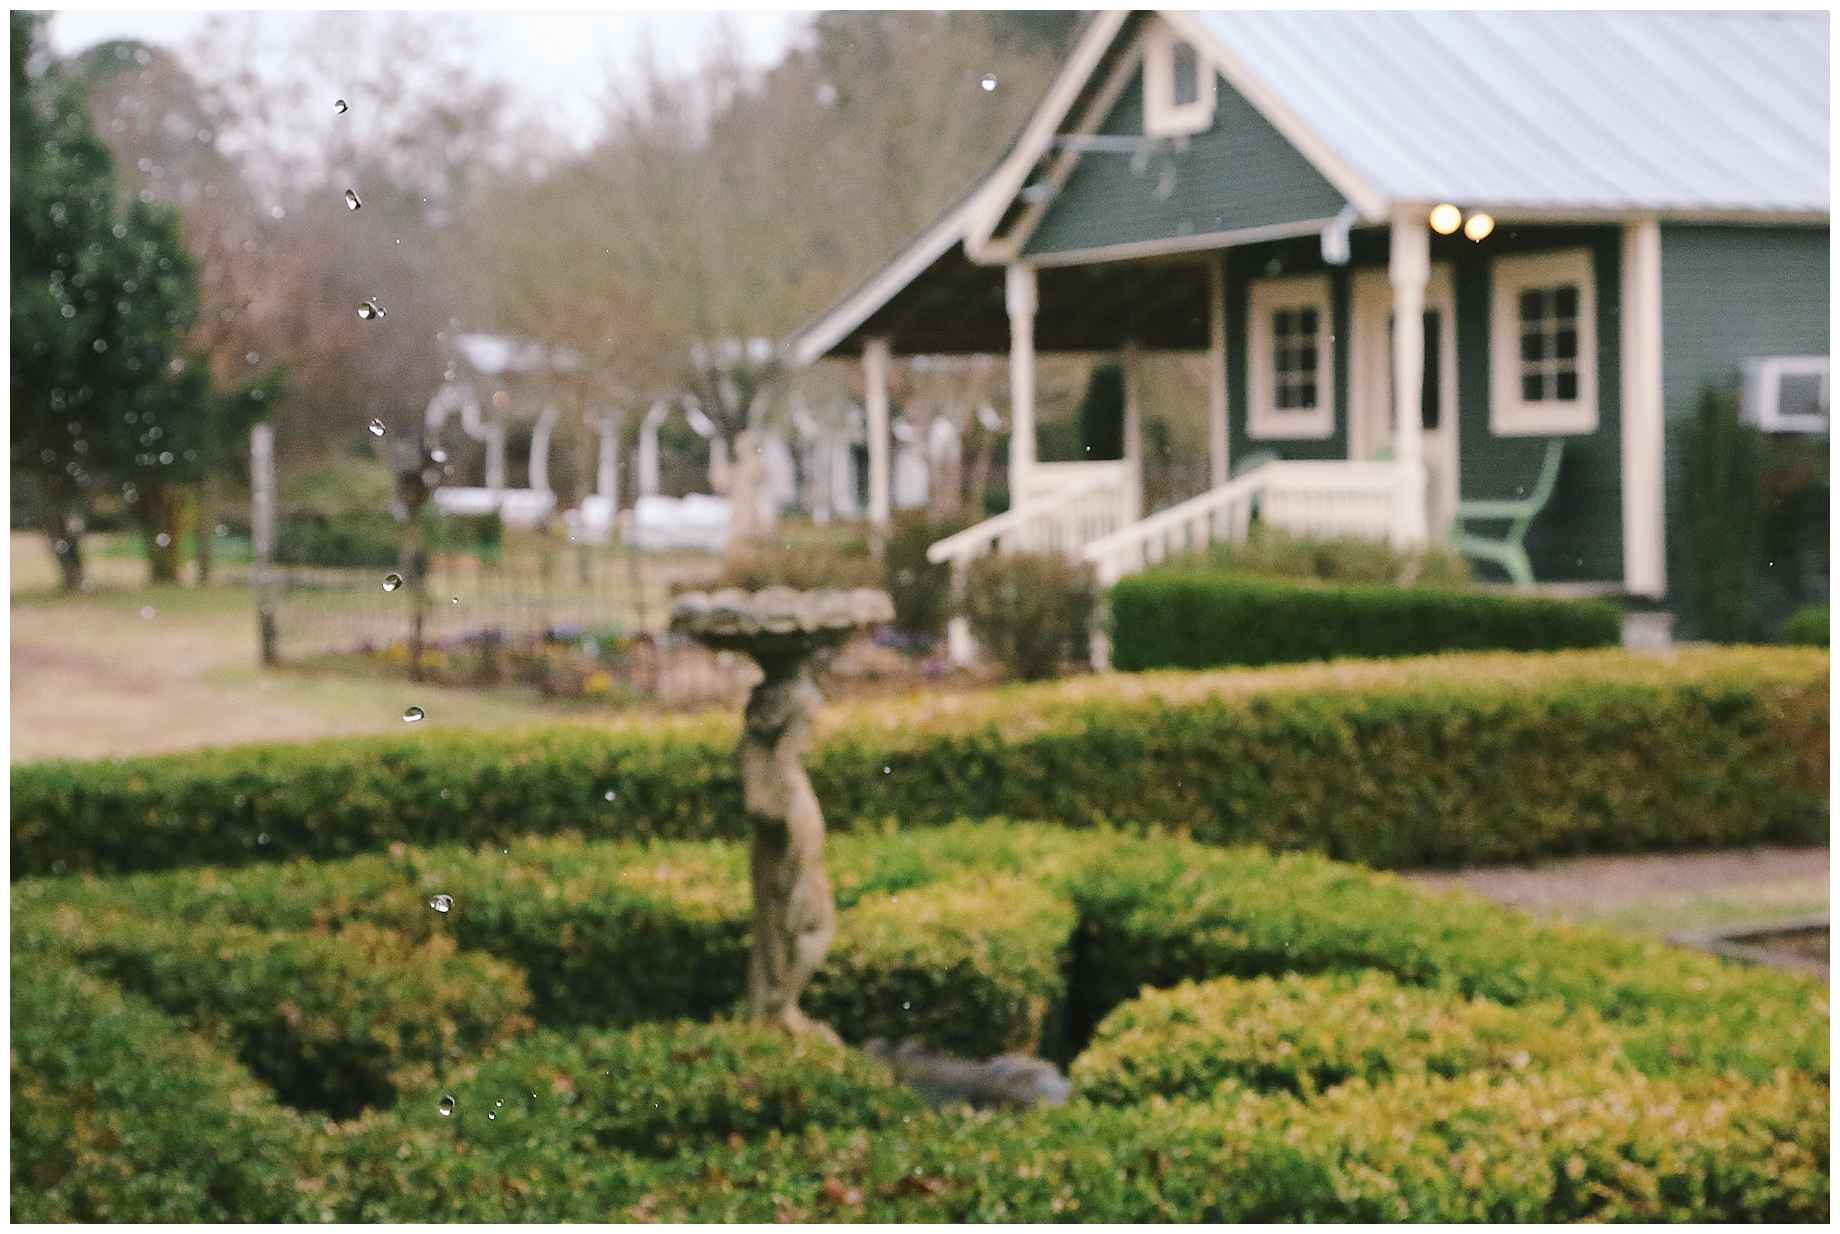 elmwood-gardens-wedding-photos-15